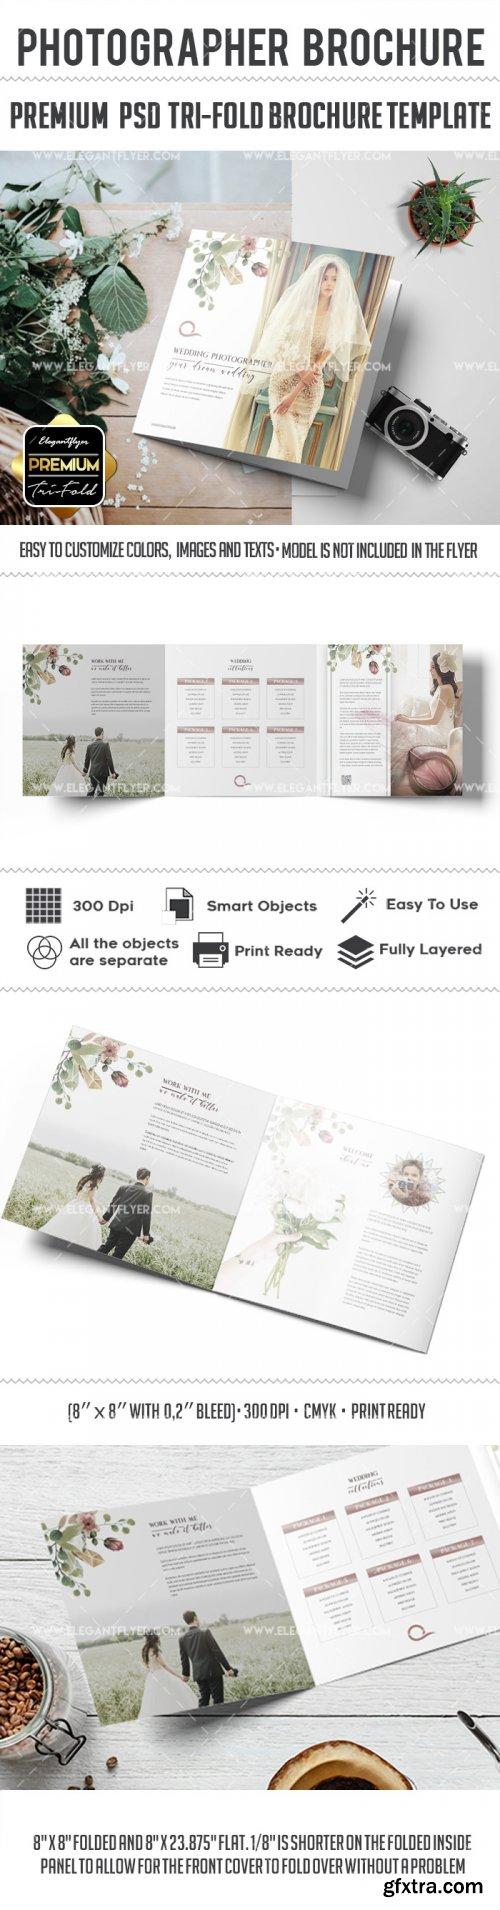 Wedding Photographer v3 2018 Tri-Fold Brochure PSD Template